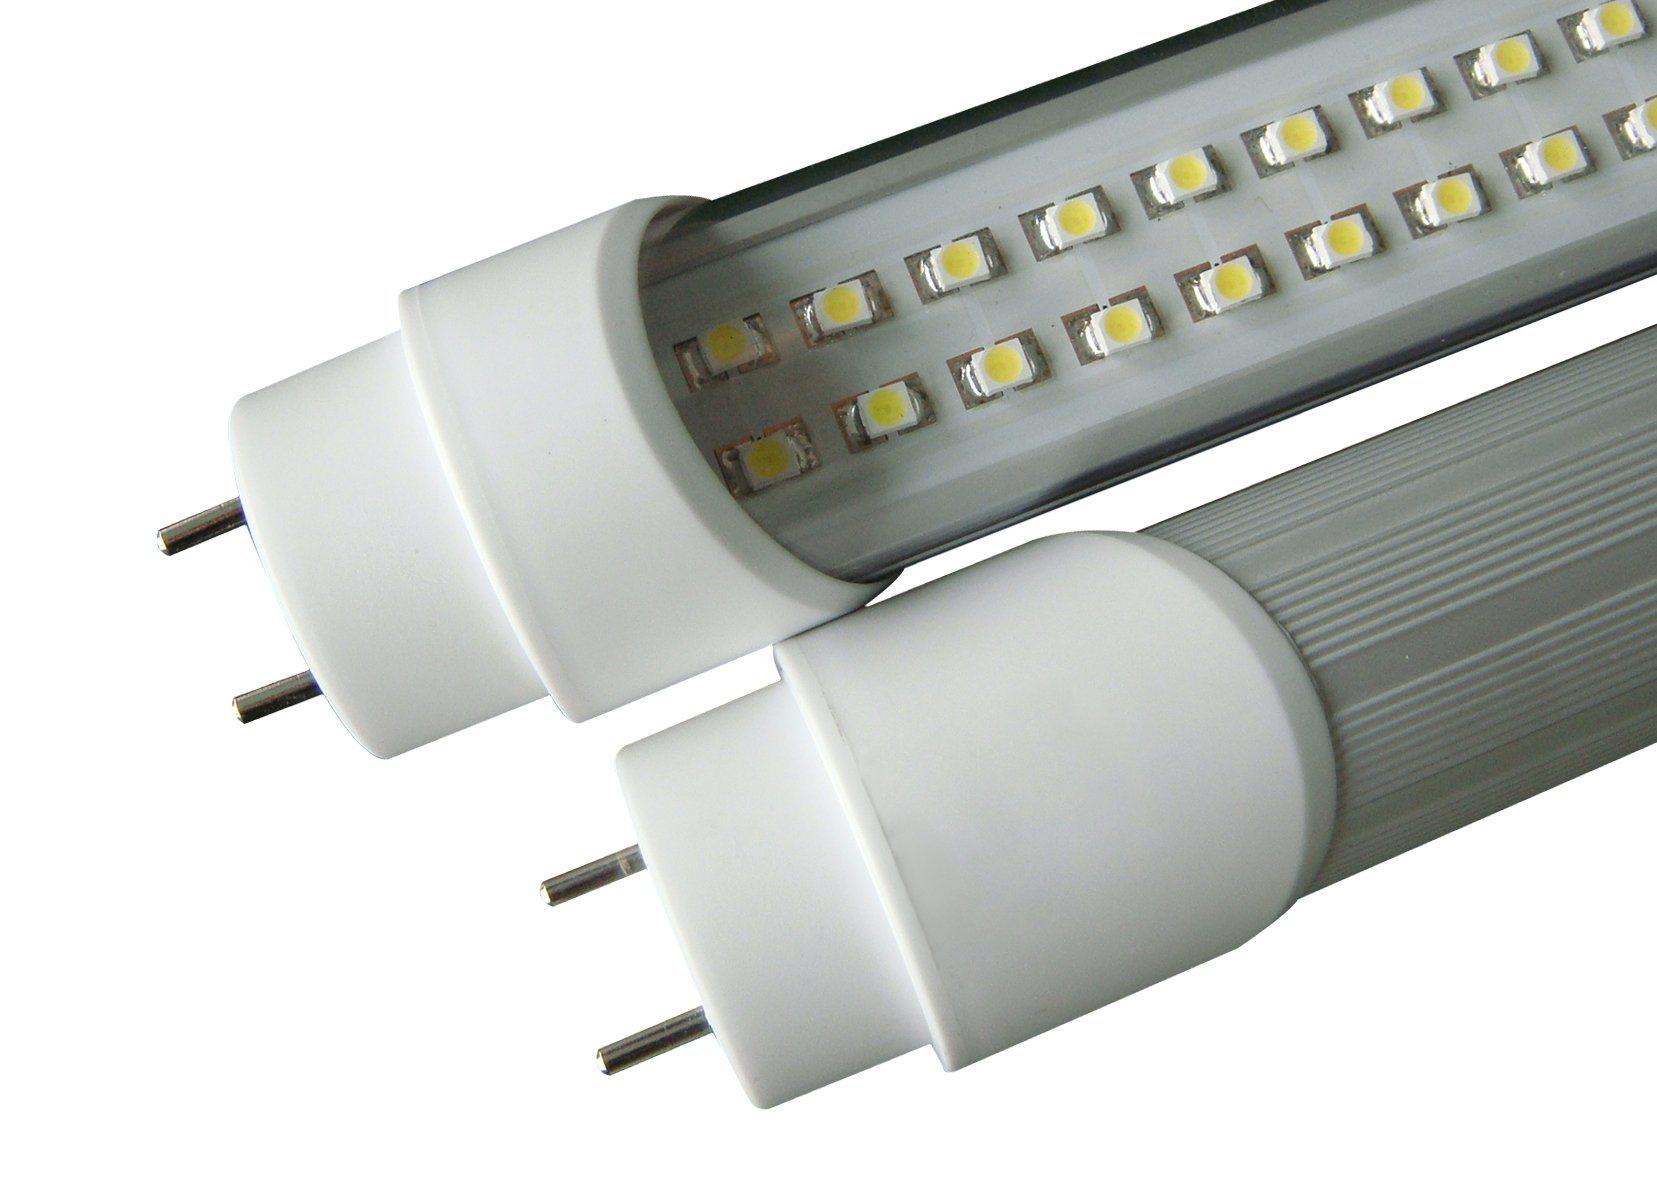 LED T8 Tube 0.6m 2835SMD LED Light LED